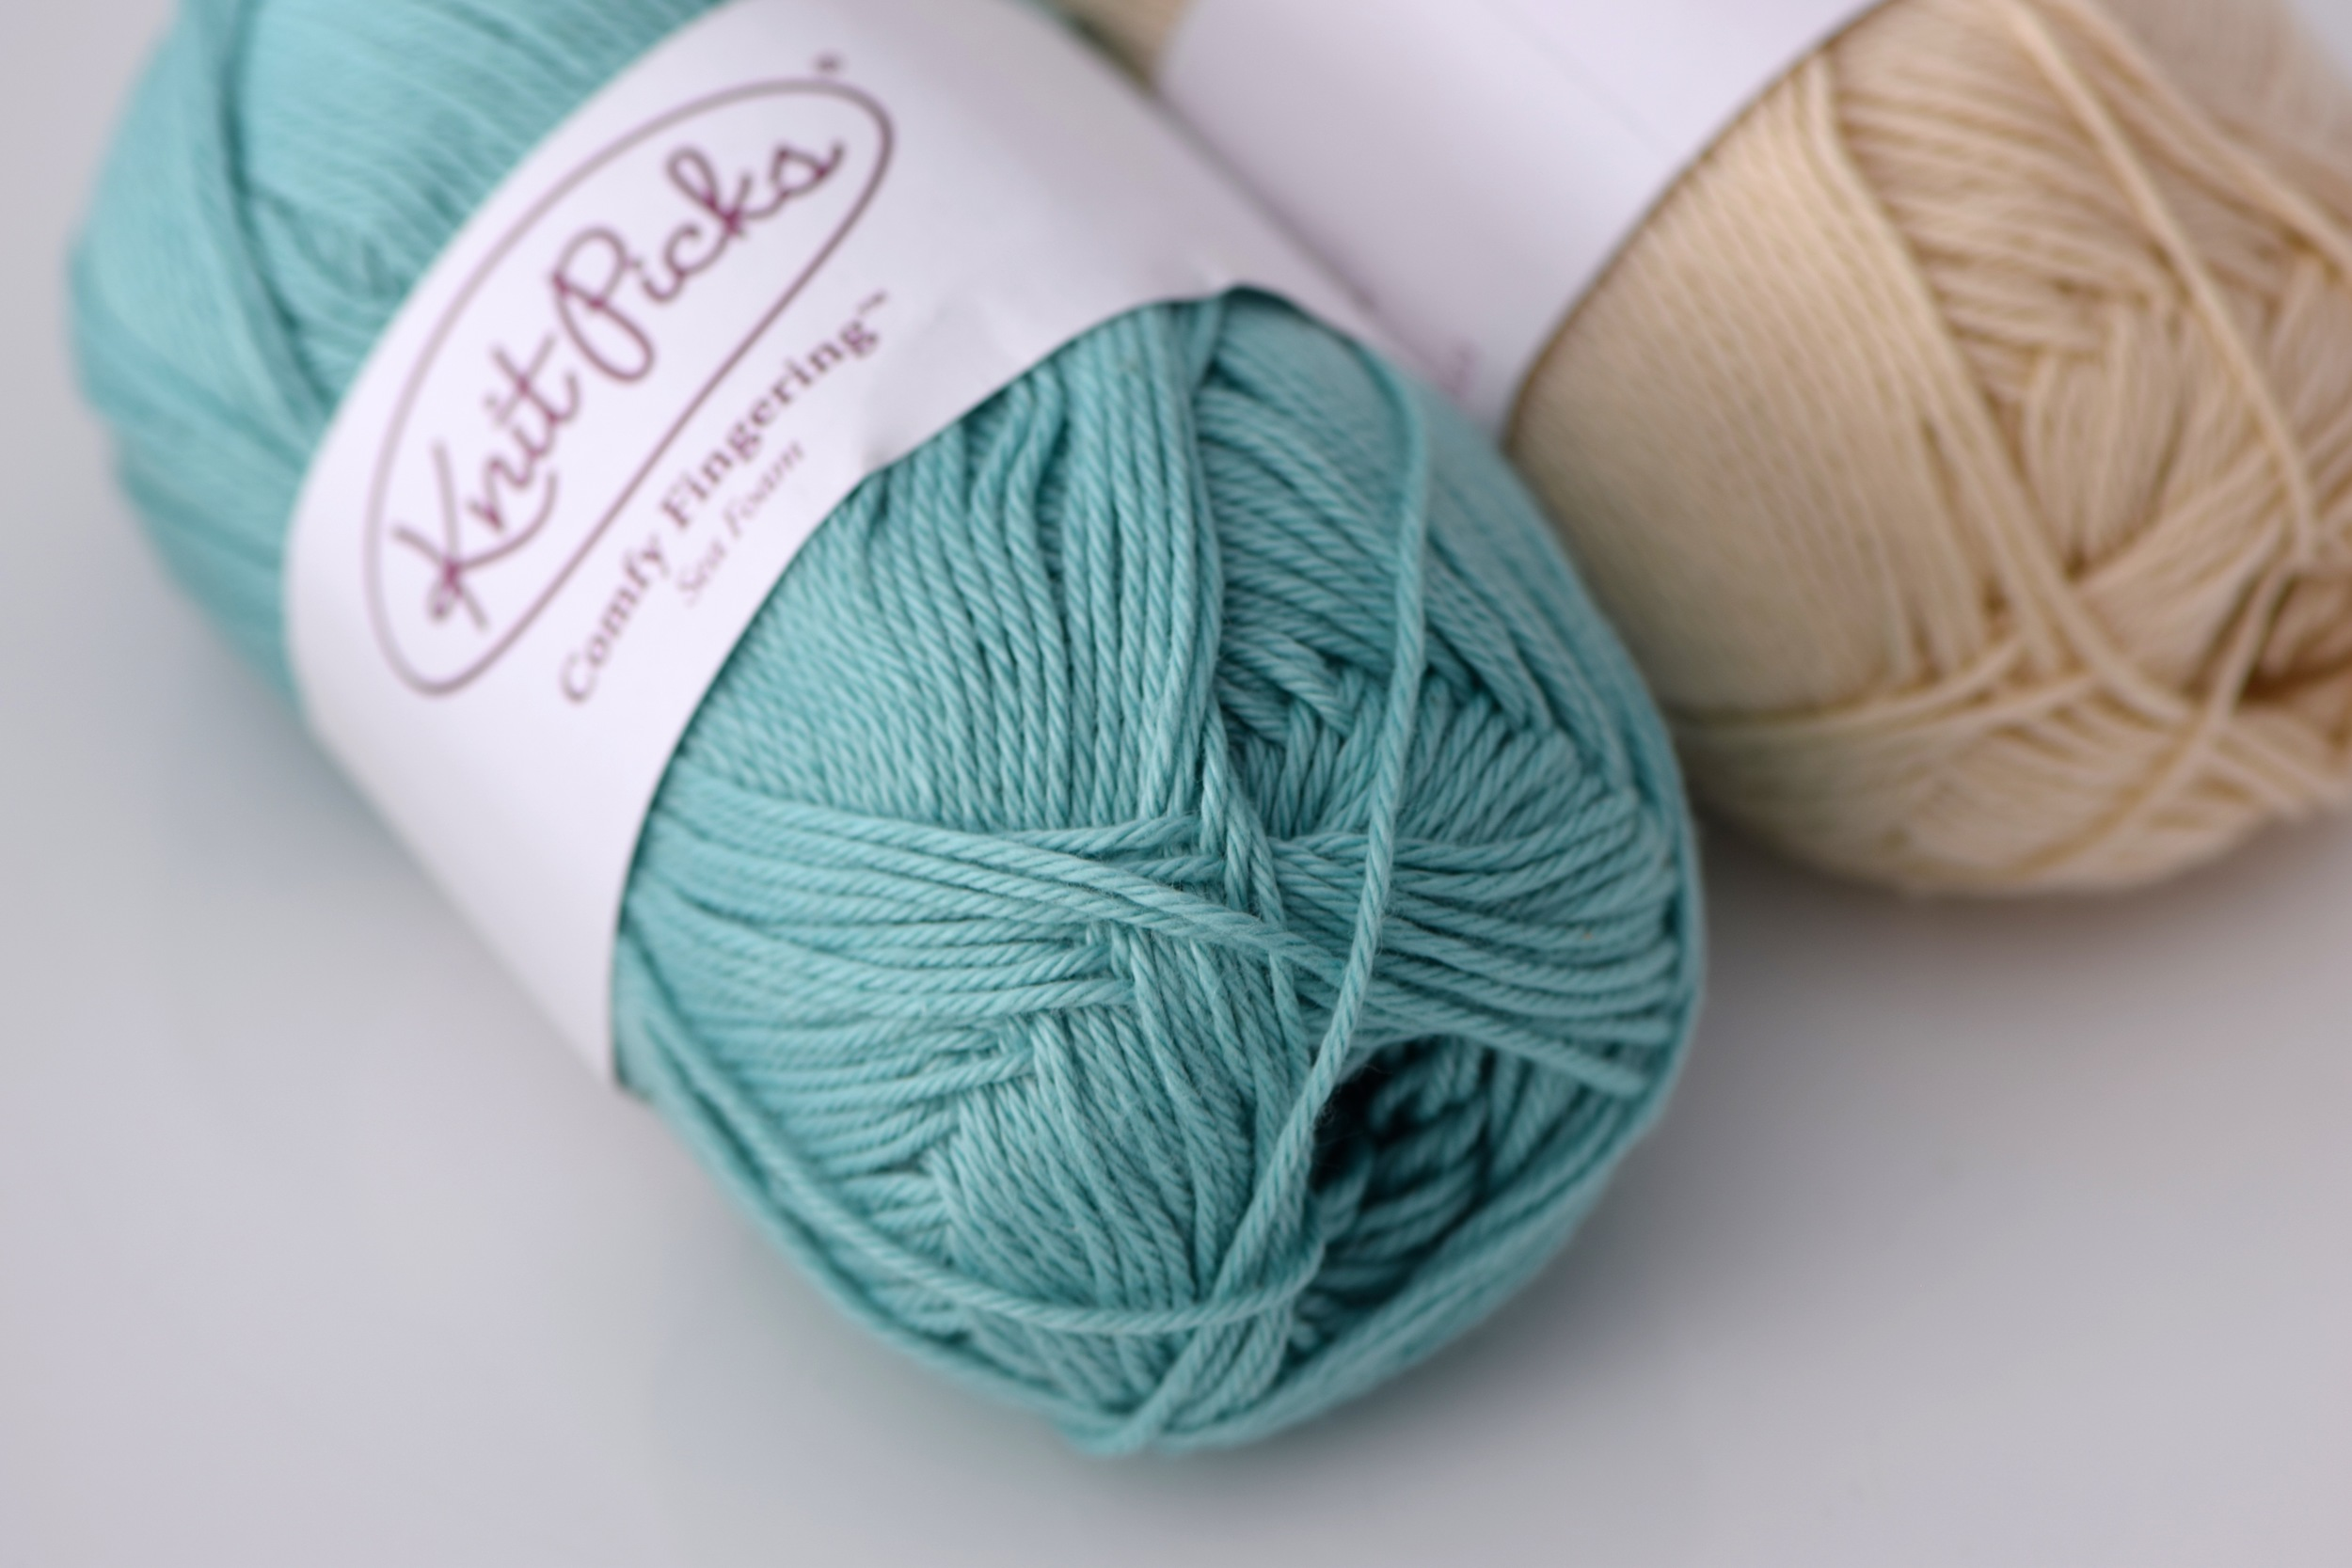 Knit Picks Comfy Yarn Giveaway